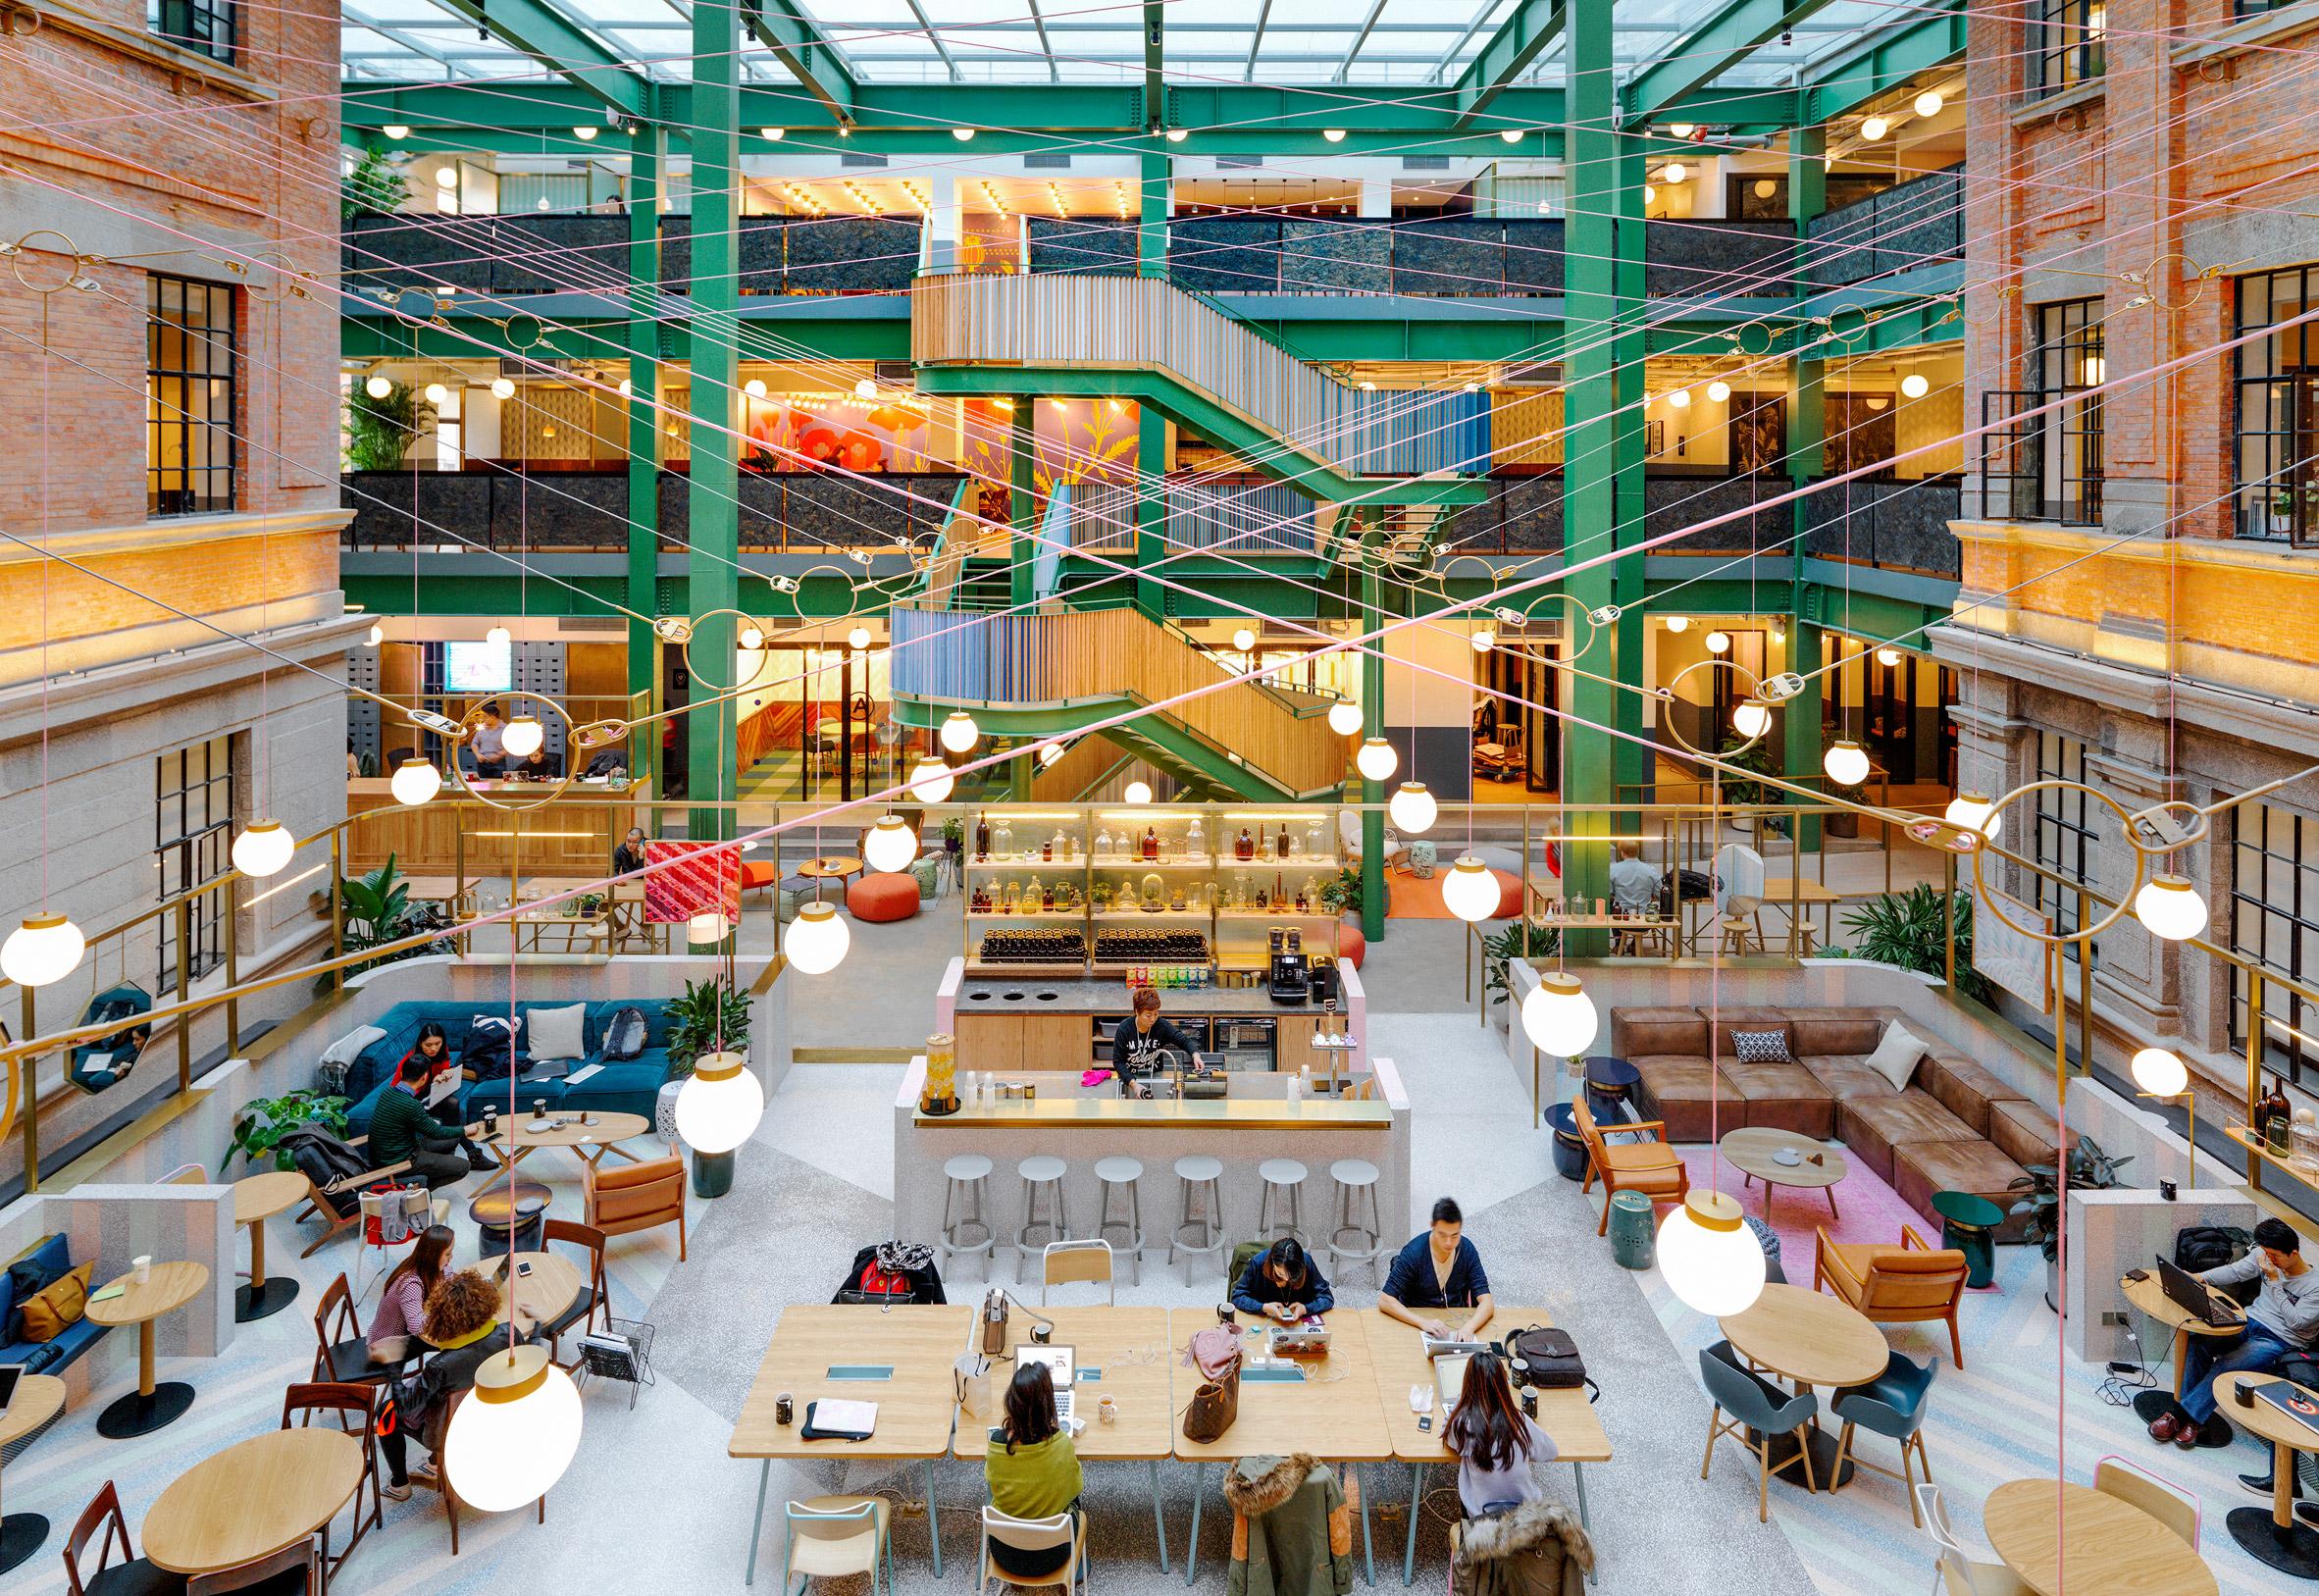 we-work-weihai-flagship-store-lushanghai-offices-retail-architecture-shanghai-china_dezeen_2364_col_0